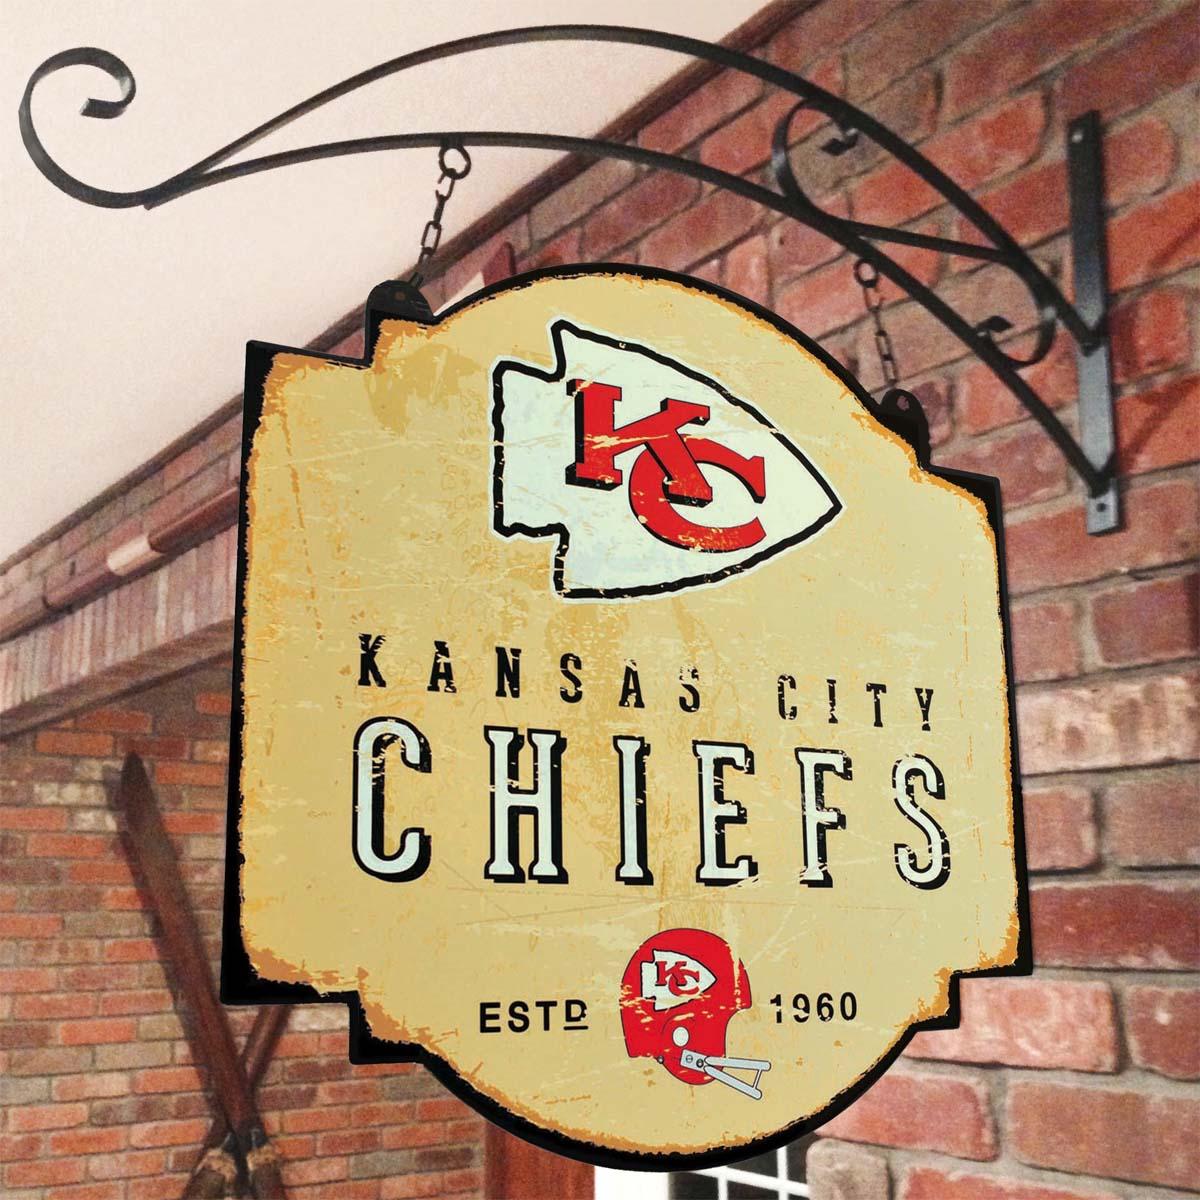 Kansas City Chiefs Vintage Tavern Sign